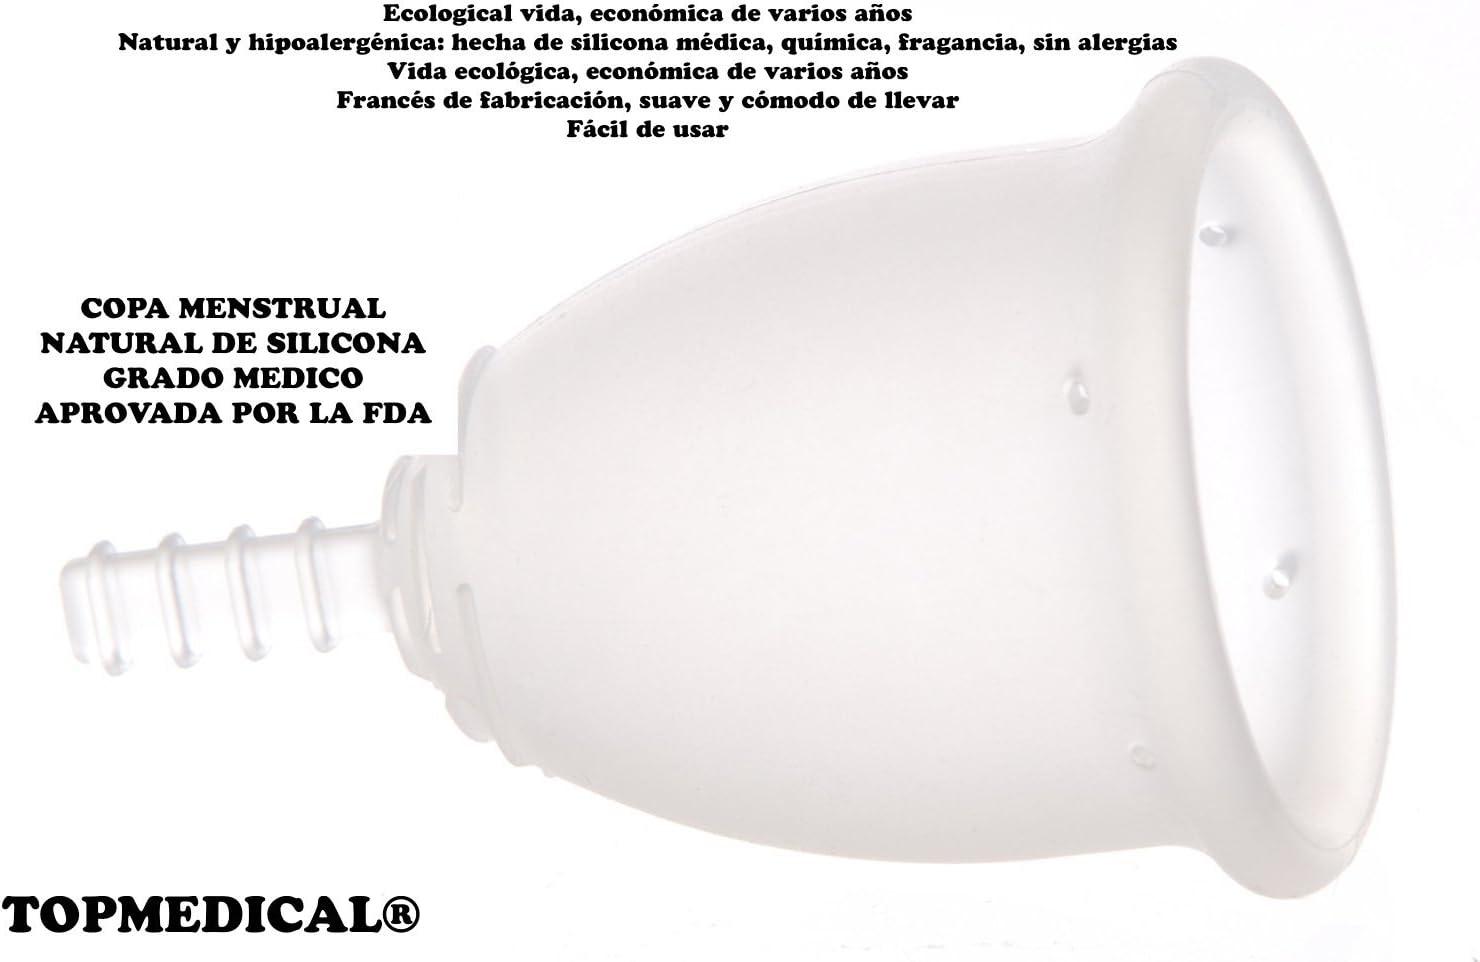 SOFTCUP COPA MESTRUAL REUTILIZABLE: Amazon.es: Hogar